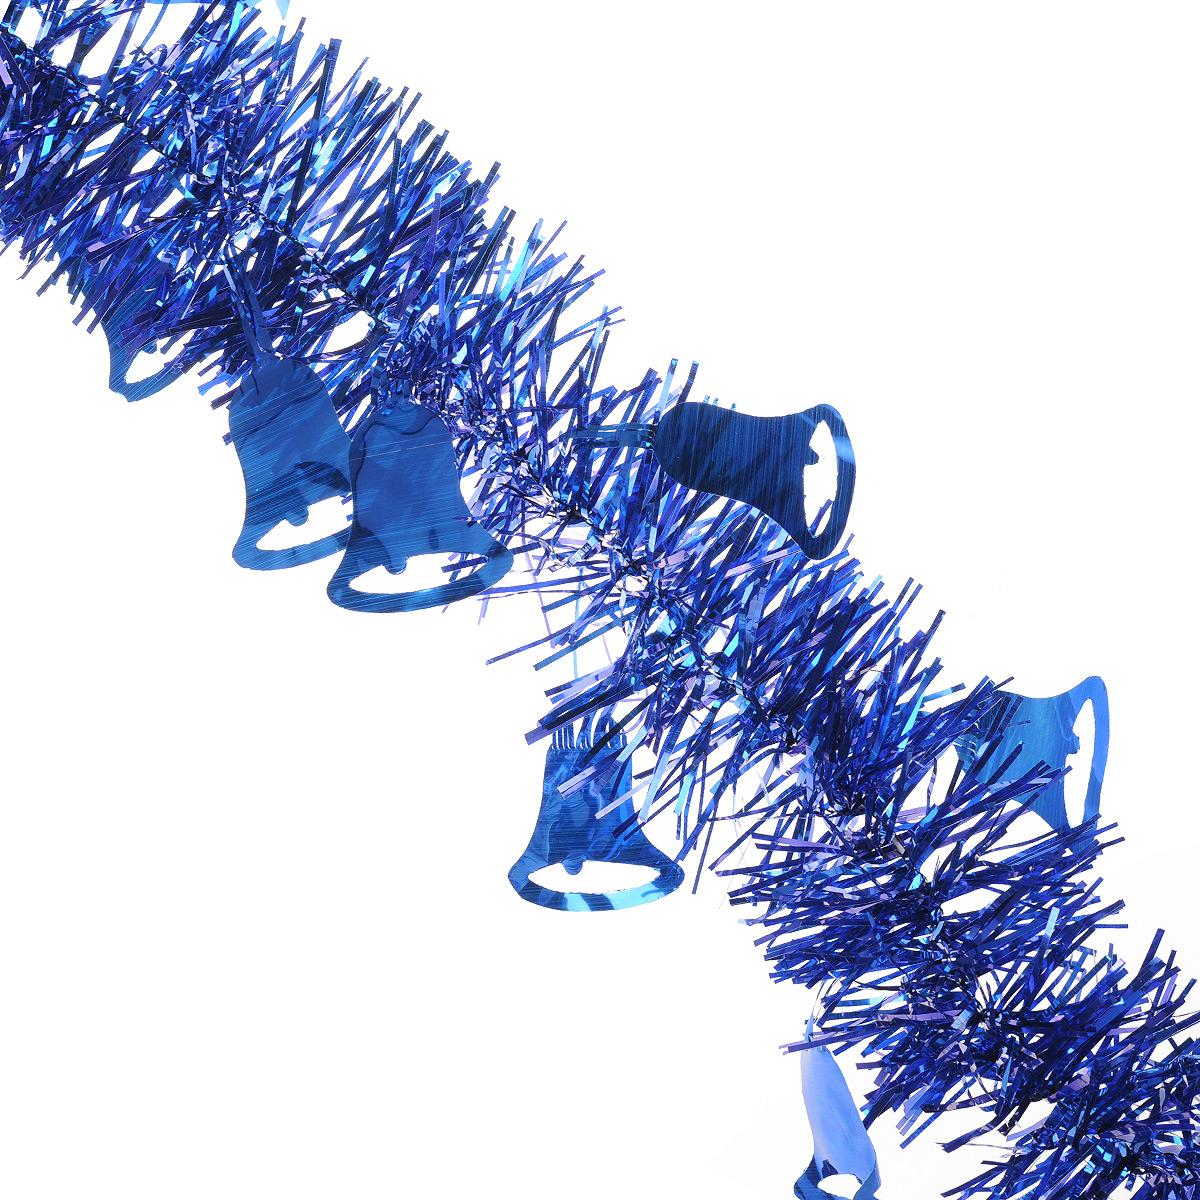 Мишура новогодняя Sima-land, цвет: синий, диаметр 8 см, длина 2 м. 702594702594